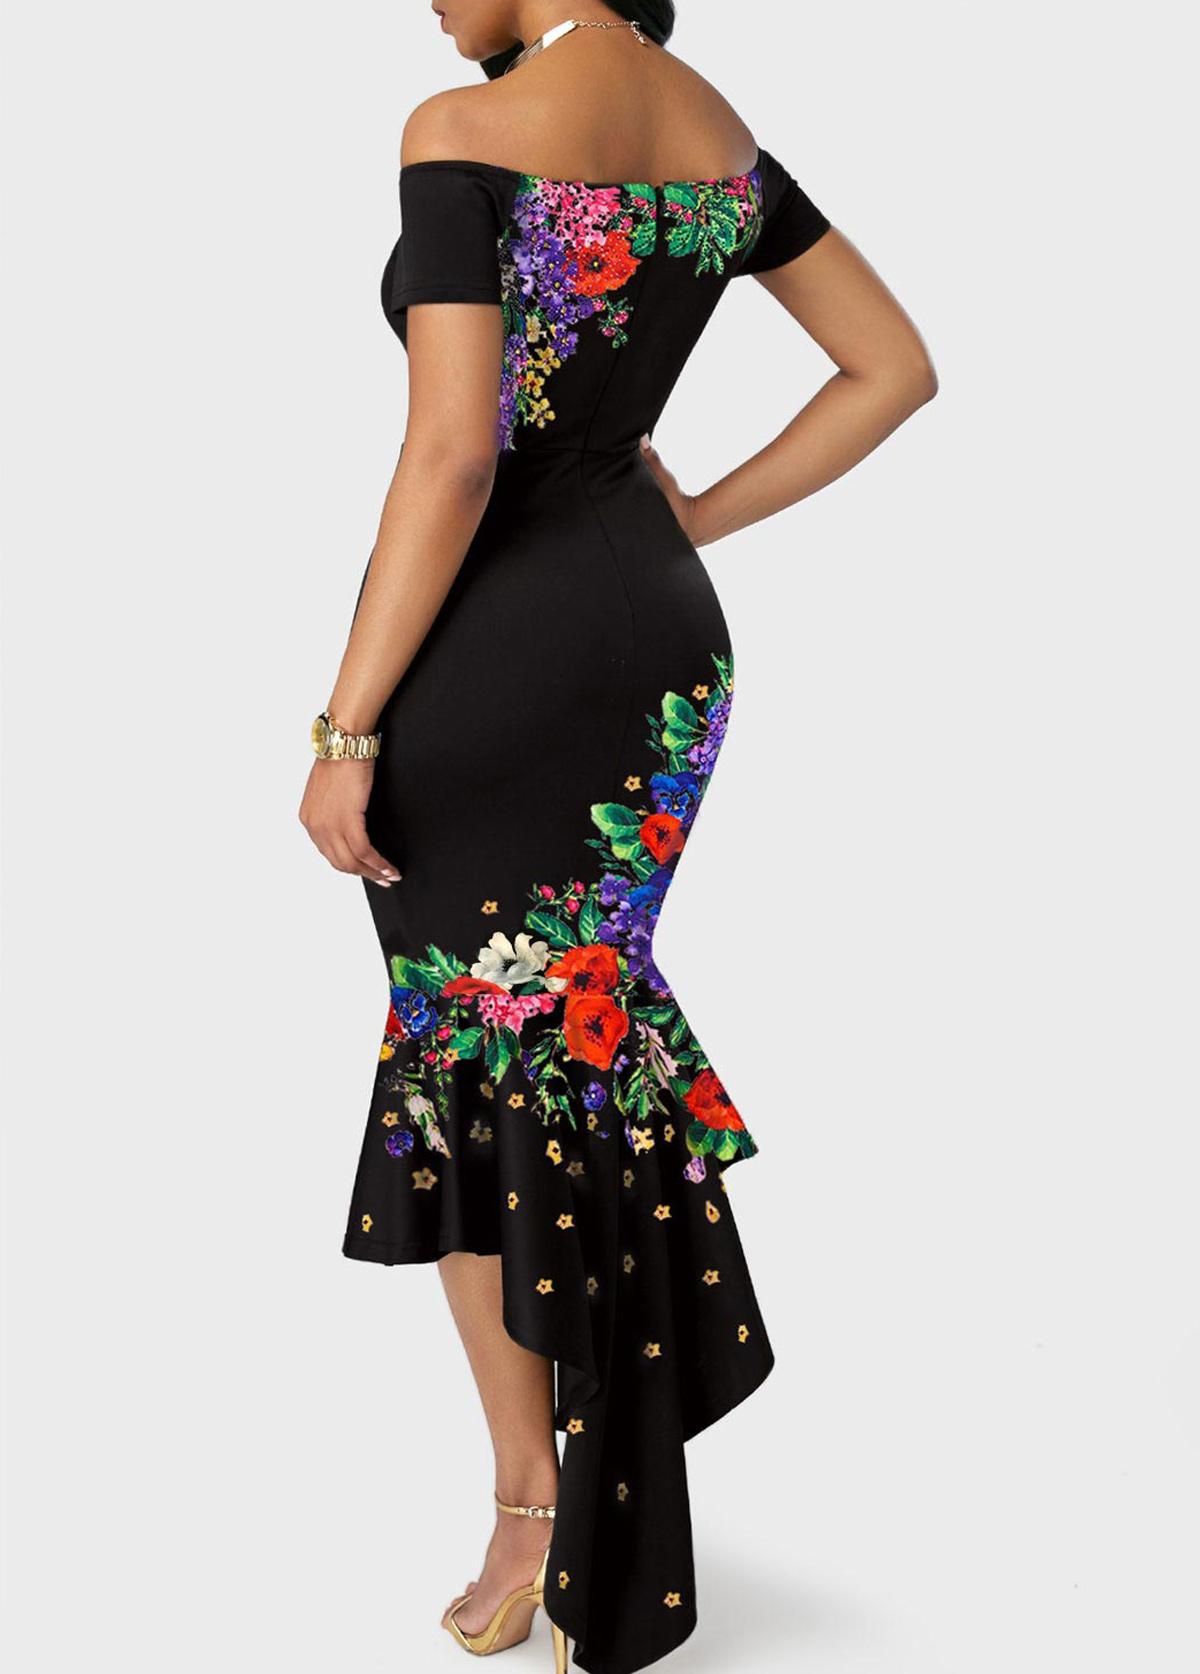 Floral Print Off the Shoulder Black Mermaid Dress